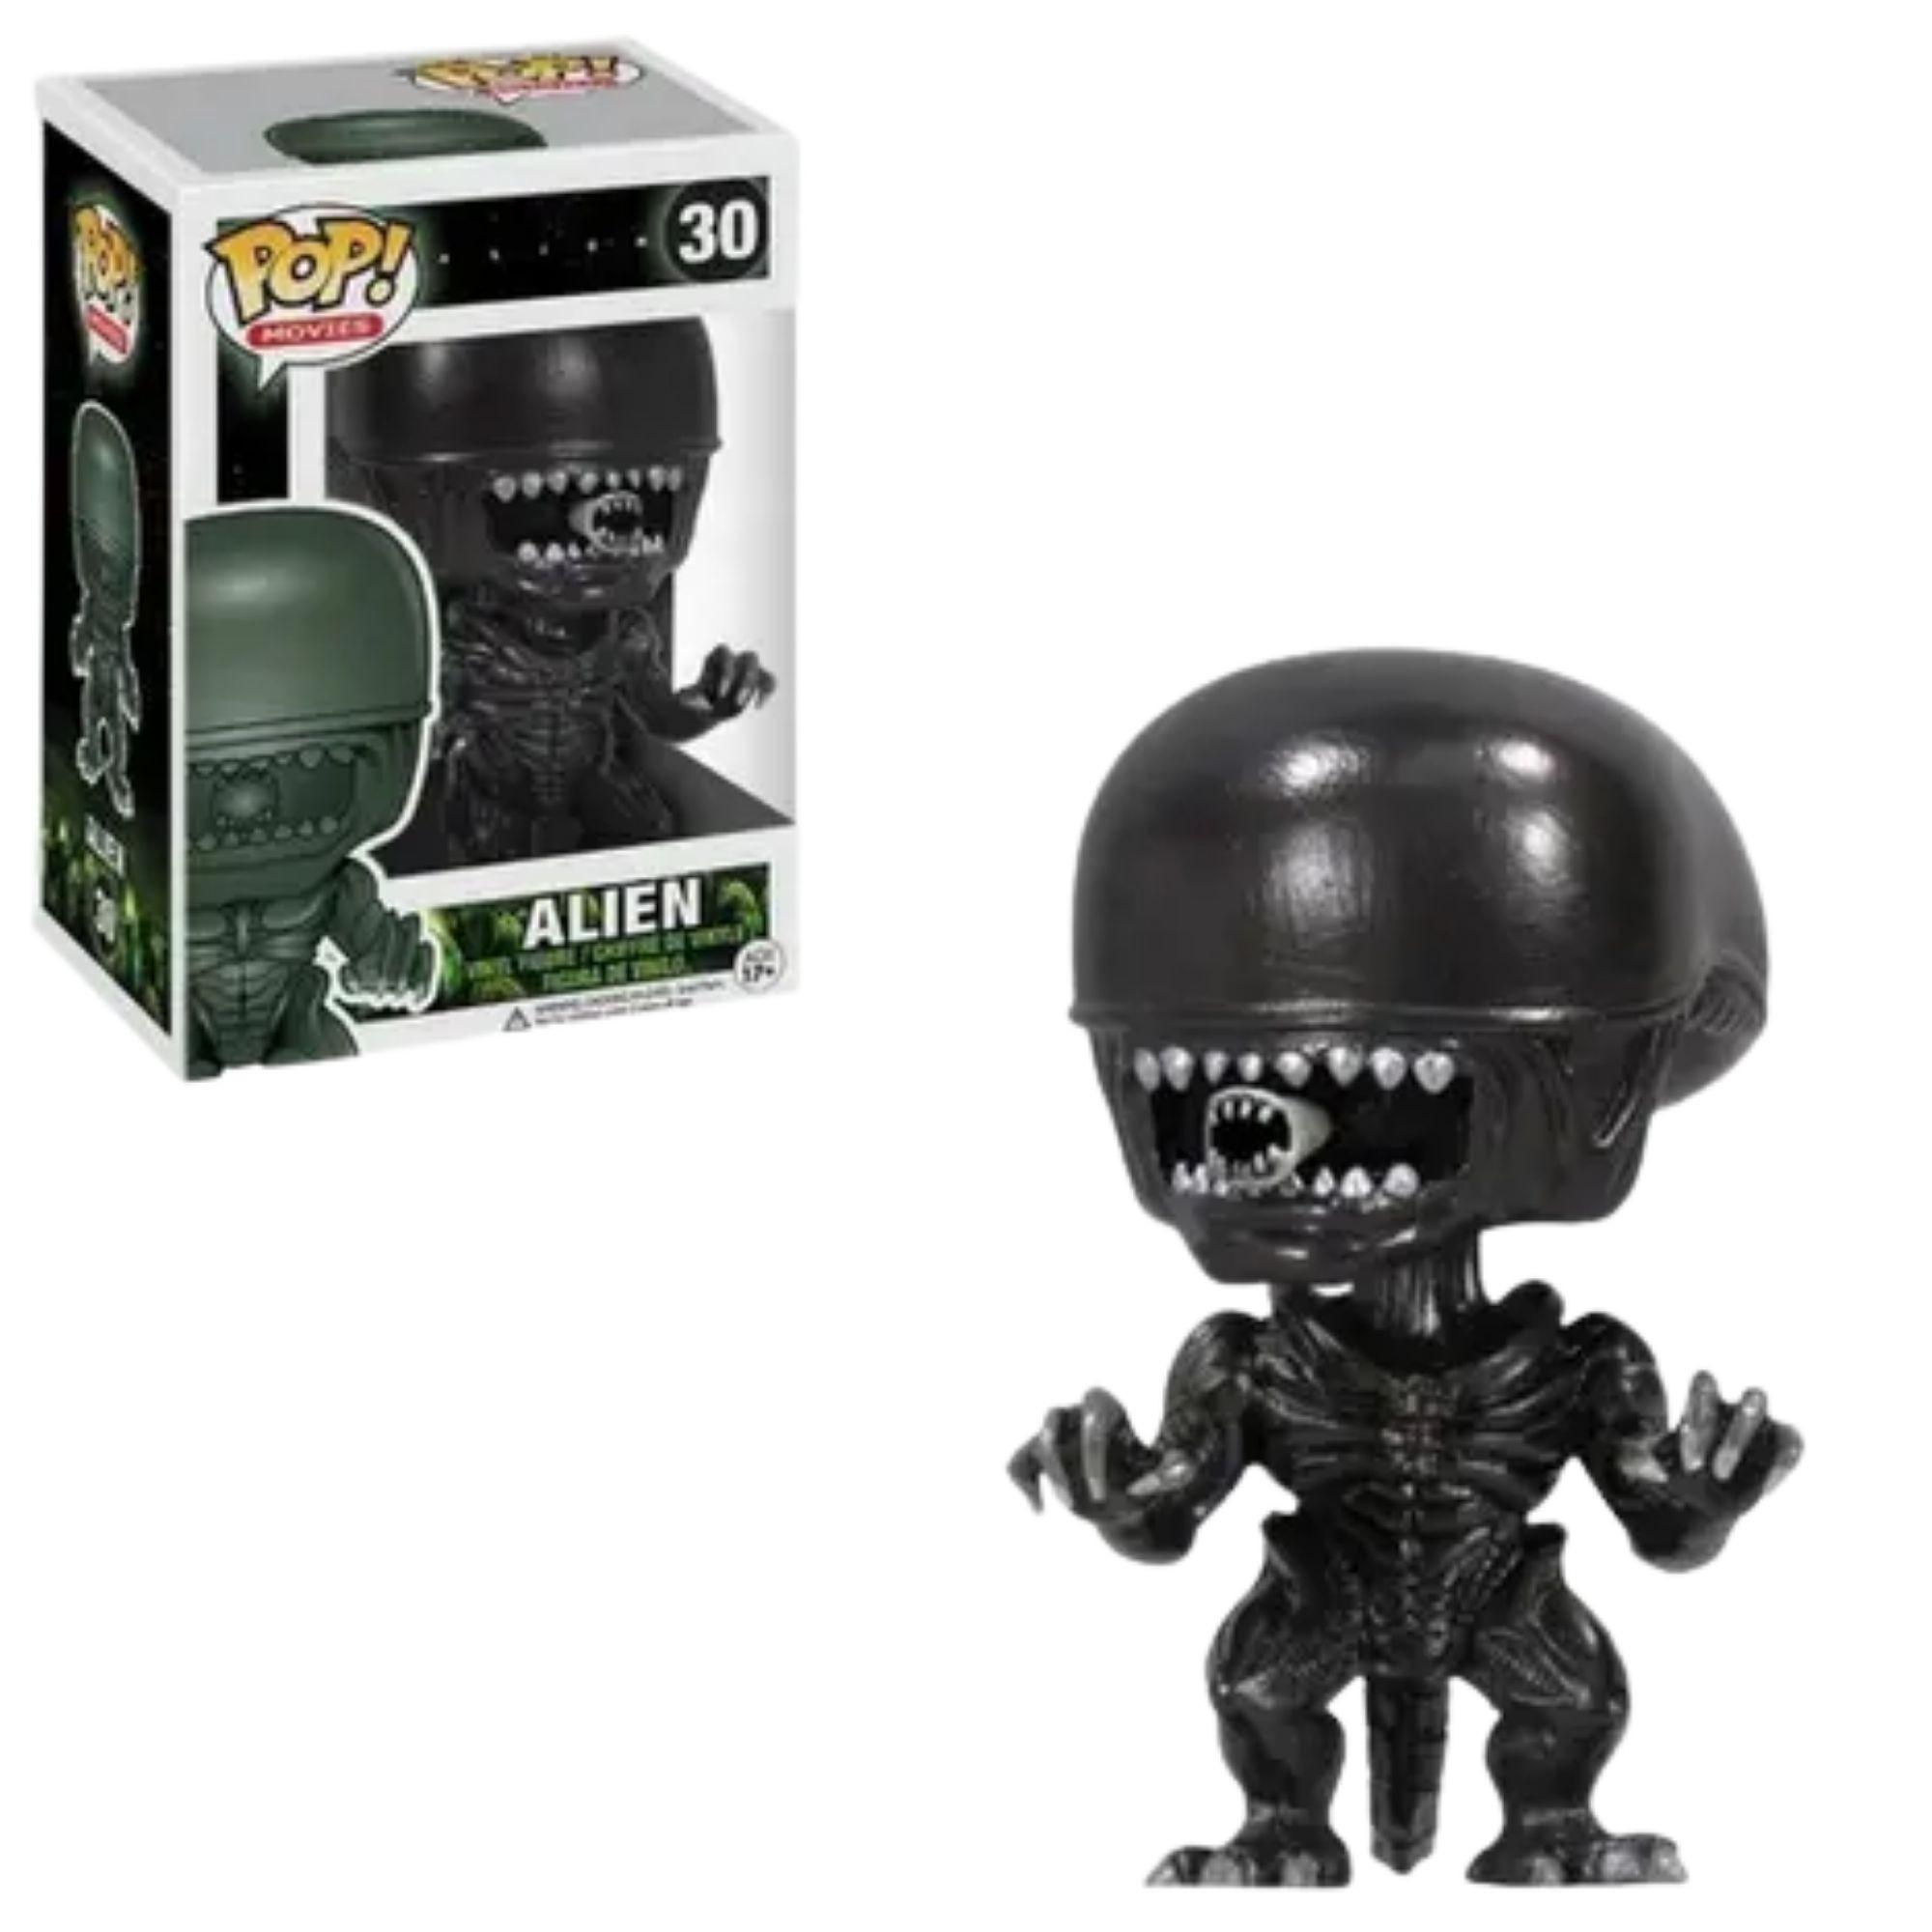 Boneco Funko Pop Movies Alien #30  - Game Land Brinquedos